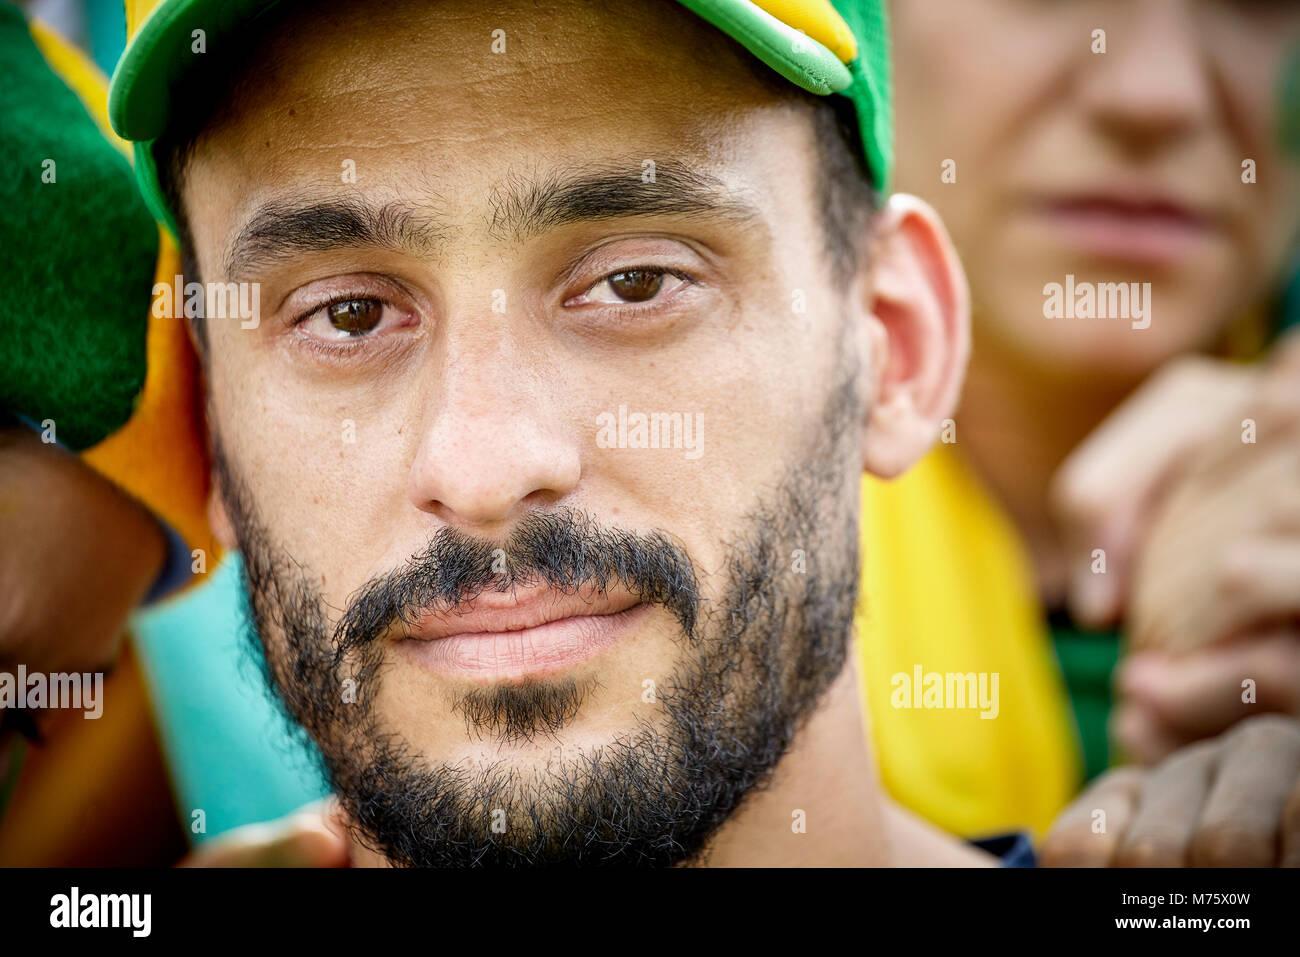 Fußball-Fan mit Tränen in den Augen, Porträt Stockbild